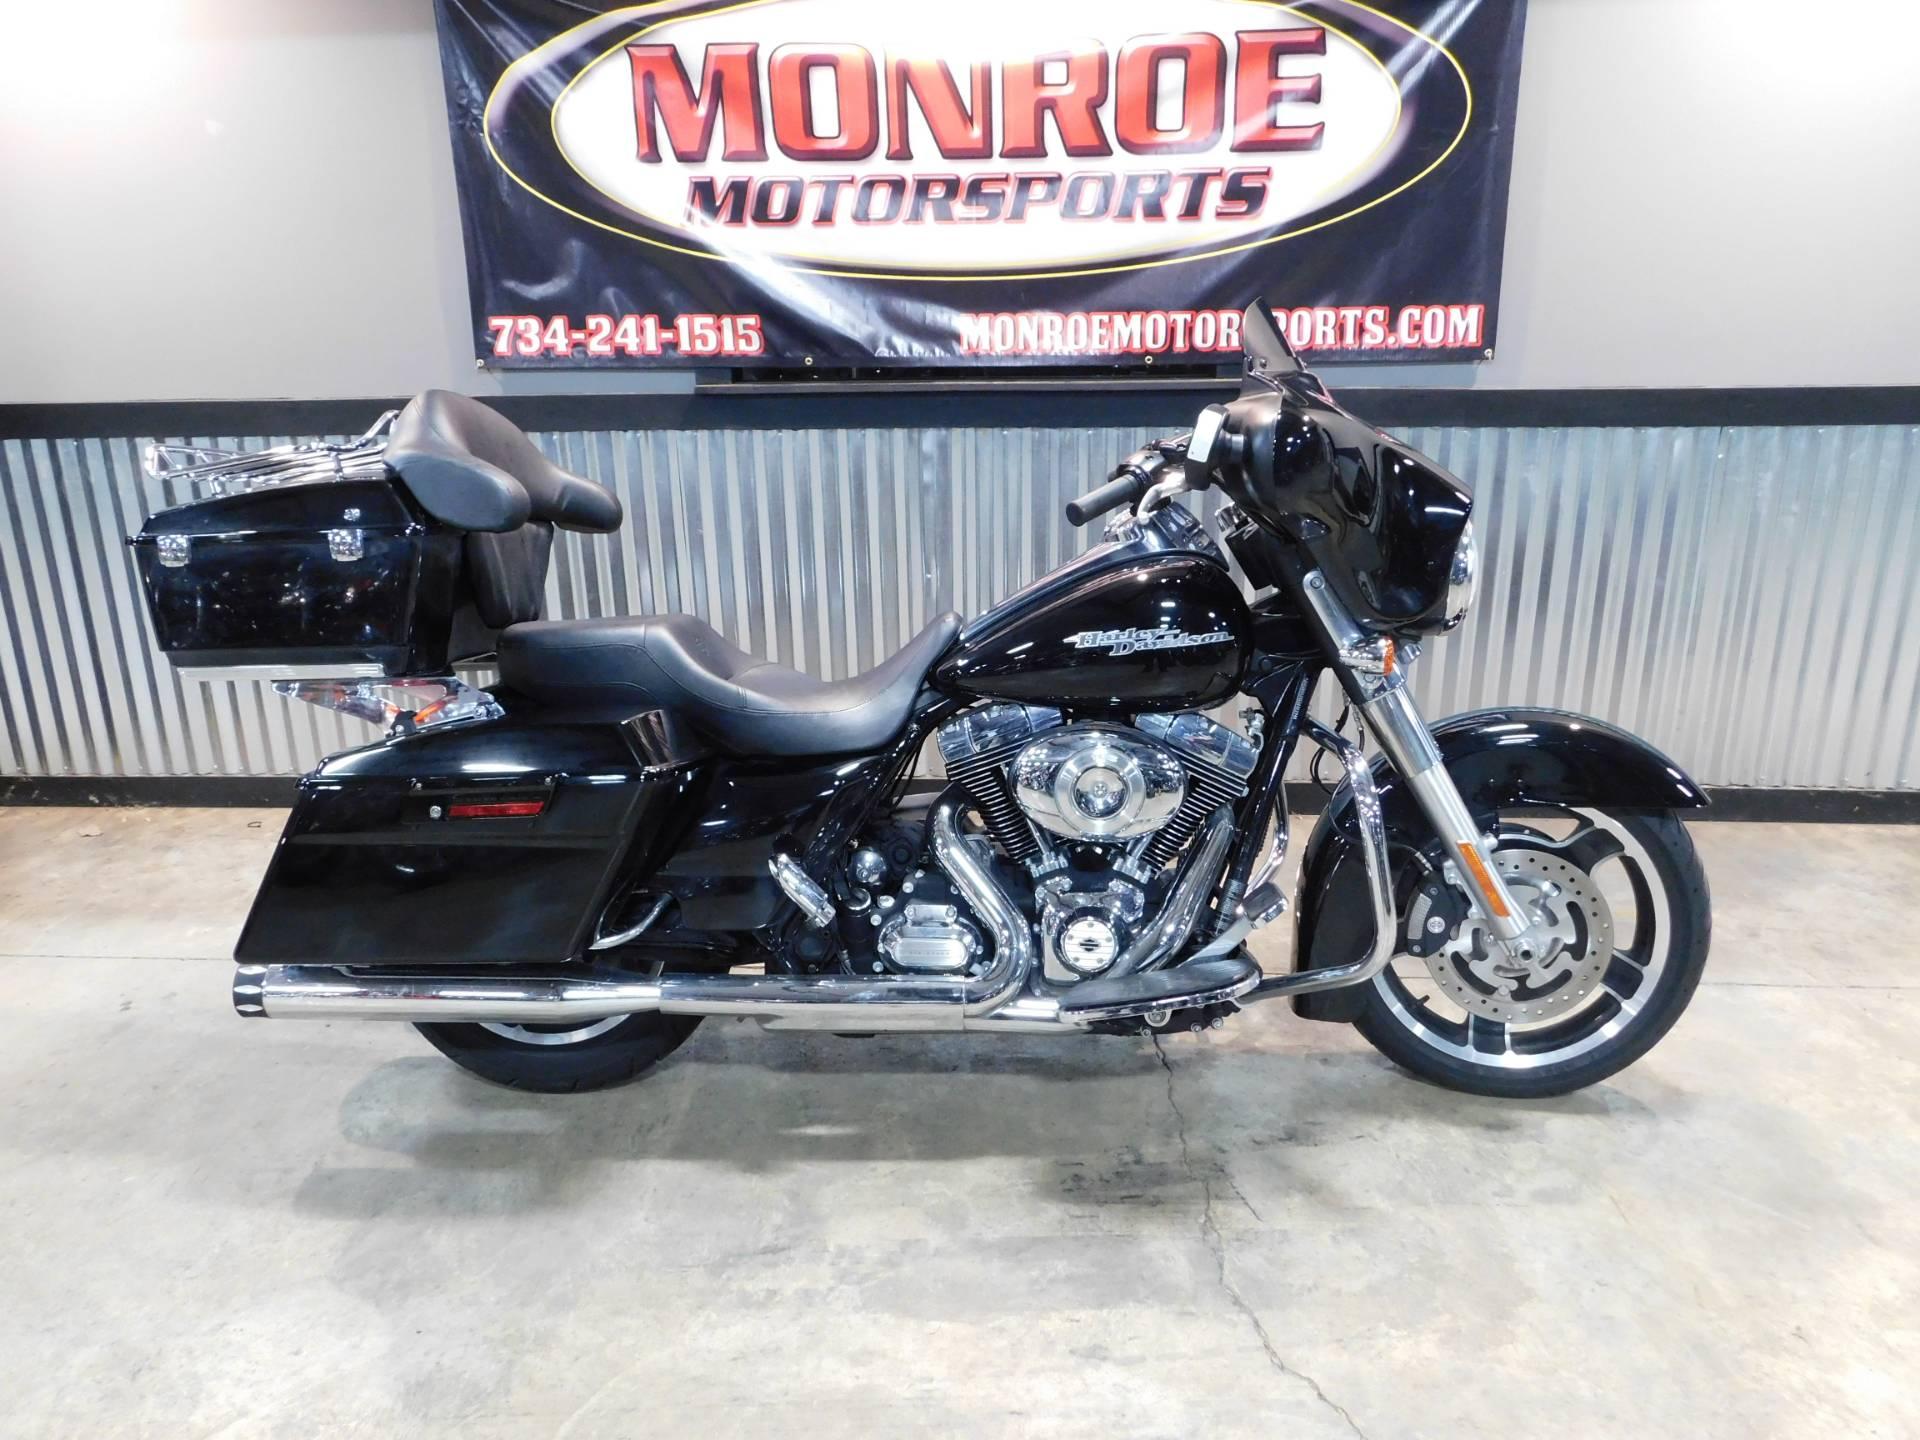 2012 Harley-Davidson Street Glide® Motorcycles Monroe Michigan HD602294